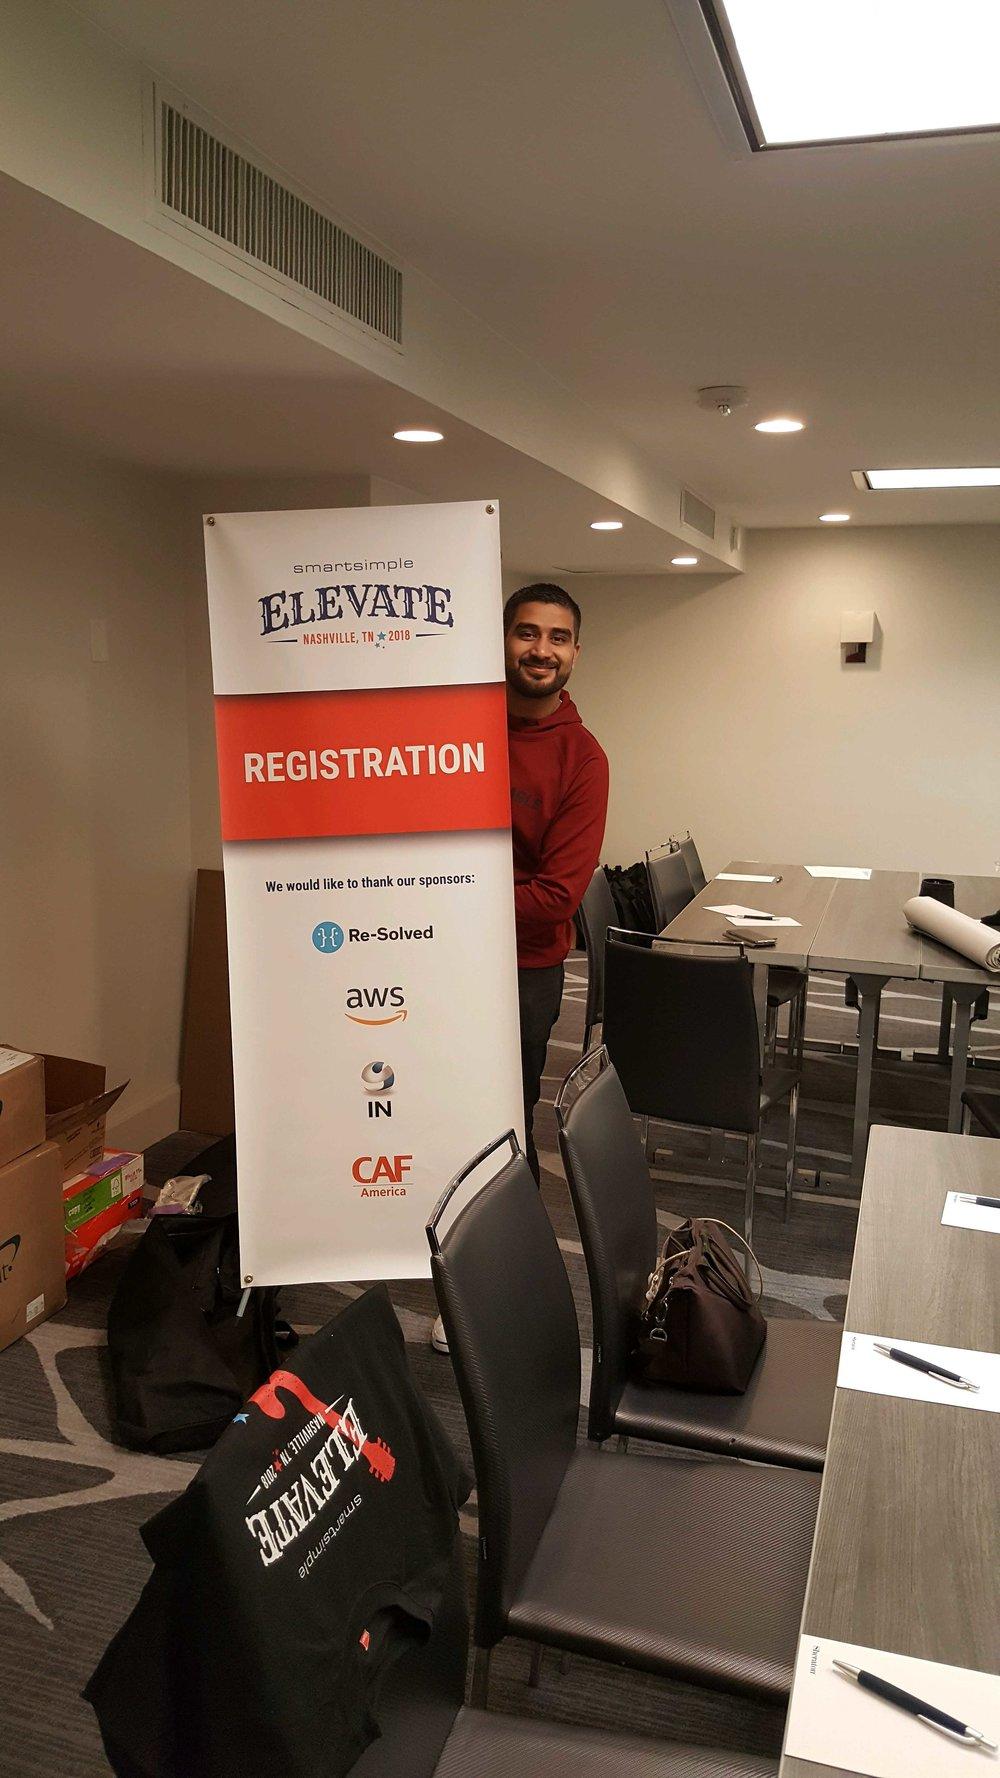 SmartSimple's Team Lead of Technical Community Support, Arjun Hiranandani, setting up for Elevate